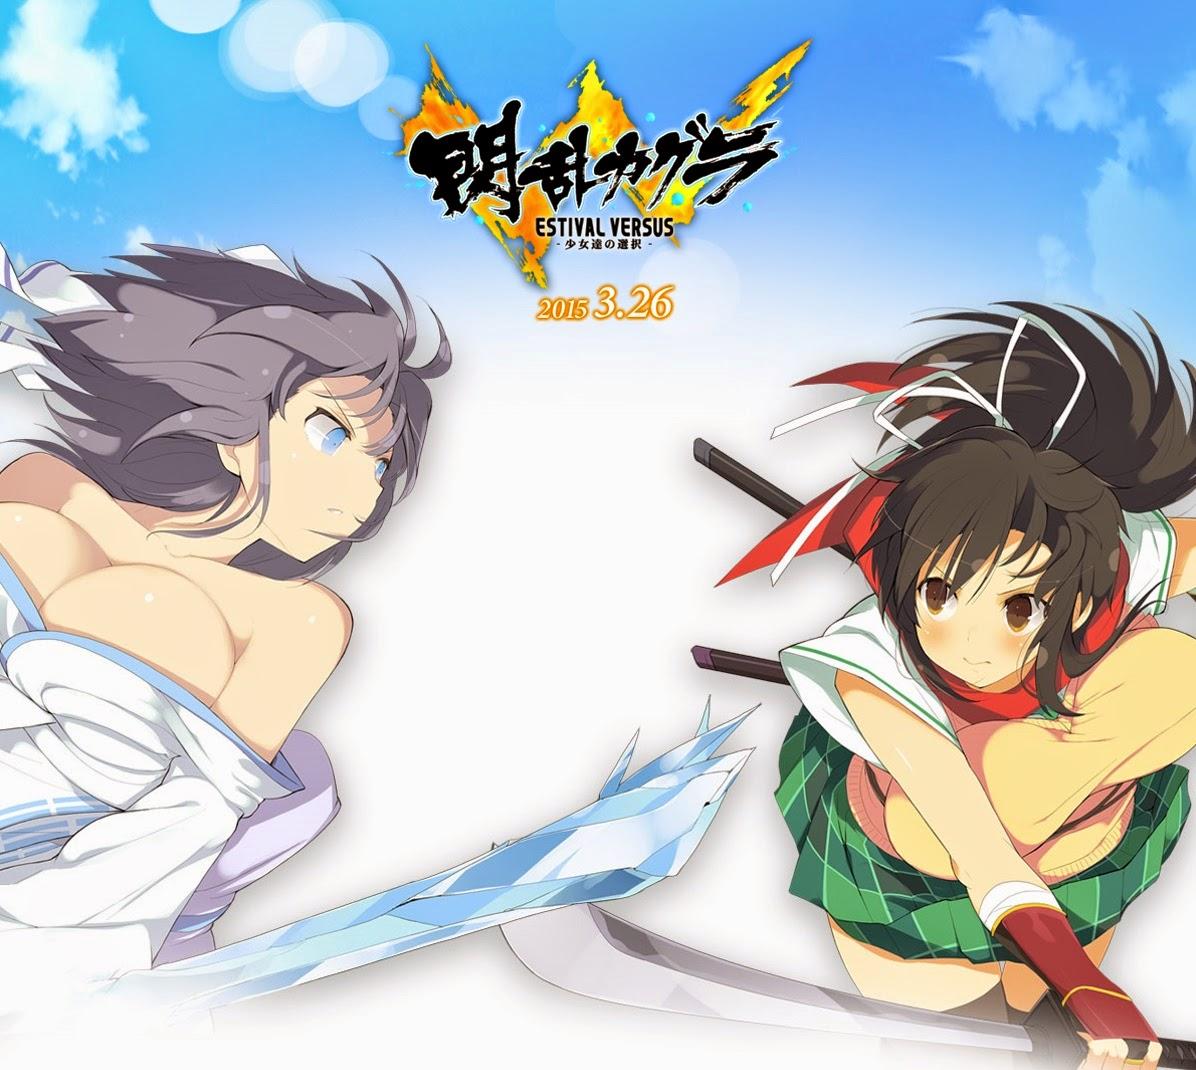 versus anime kagura estival Senran